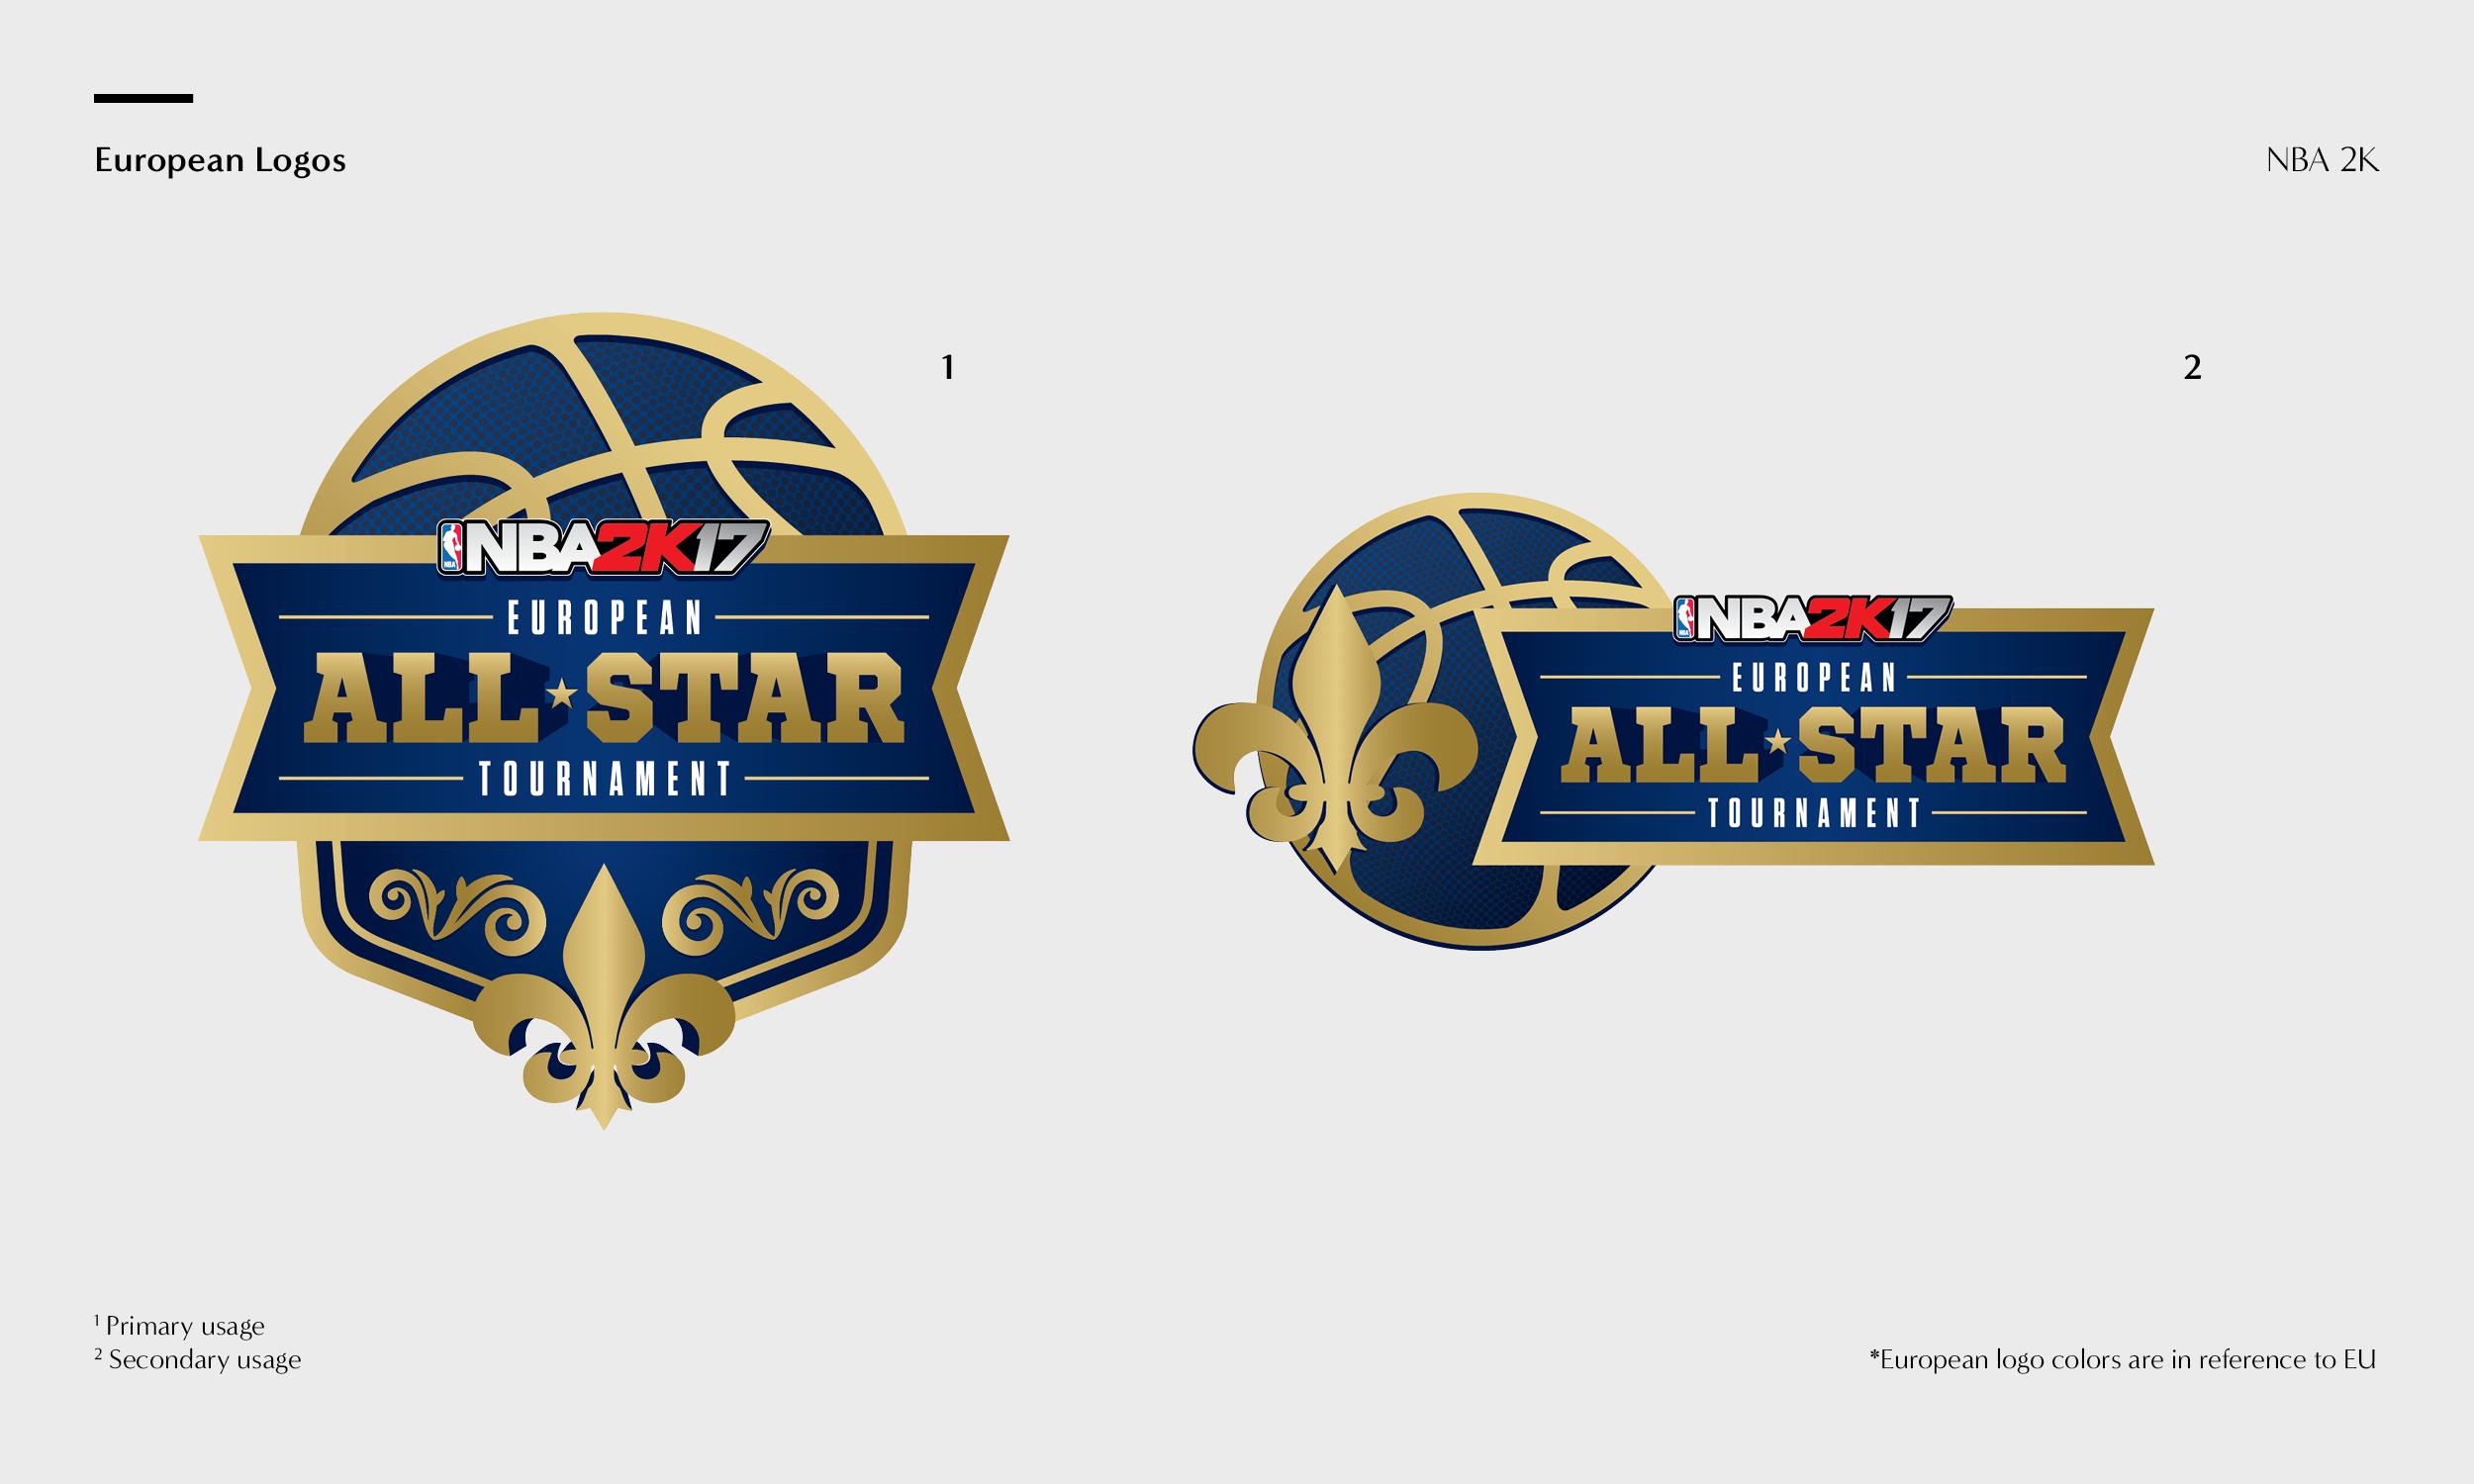 2017_All-Star_Tournament3.jpg